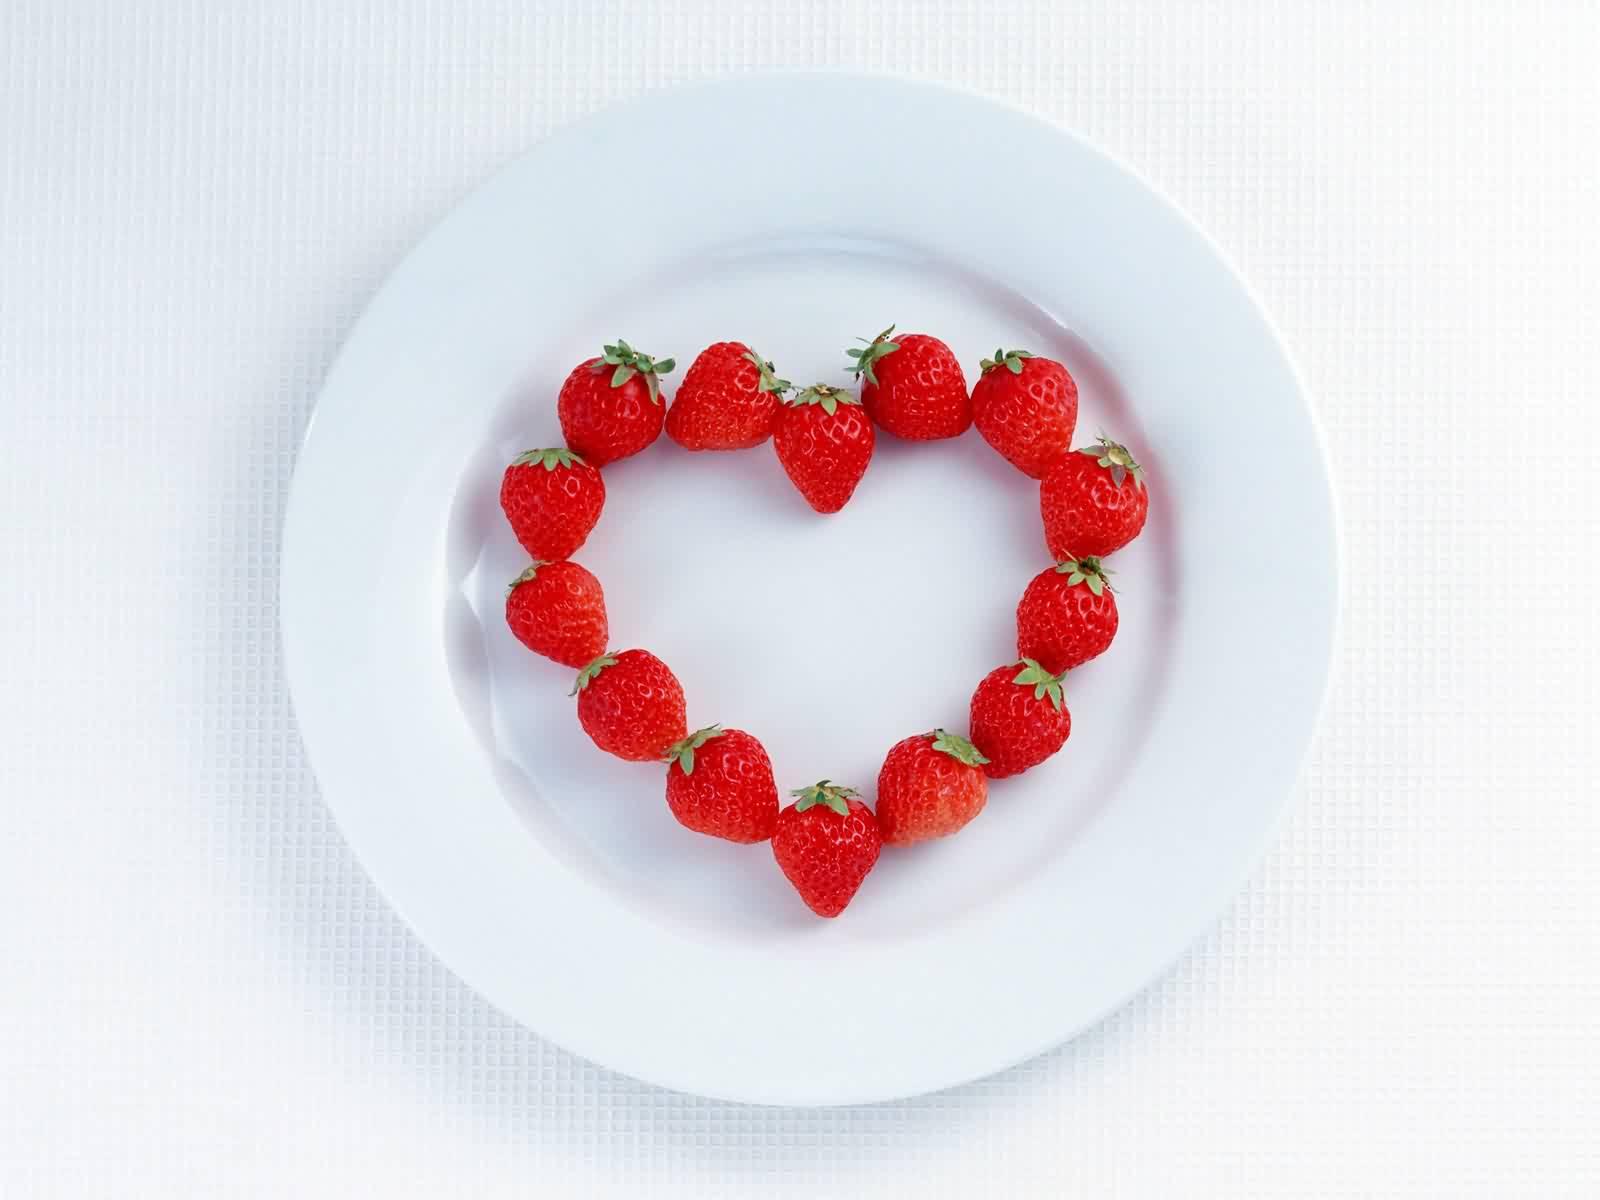 http://1.bp.blogspot.com/_tg42ArcfTzU/THFSXBOZlMI/AAAAAAAABOU/O6Vra9mmIL4/s1600/Beautiful+Love+Snaps.jpeg